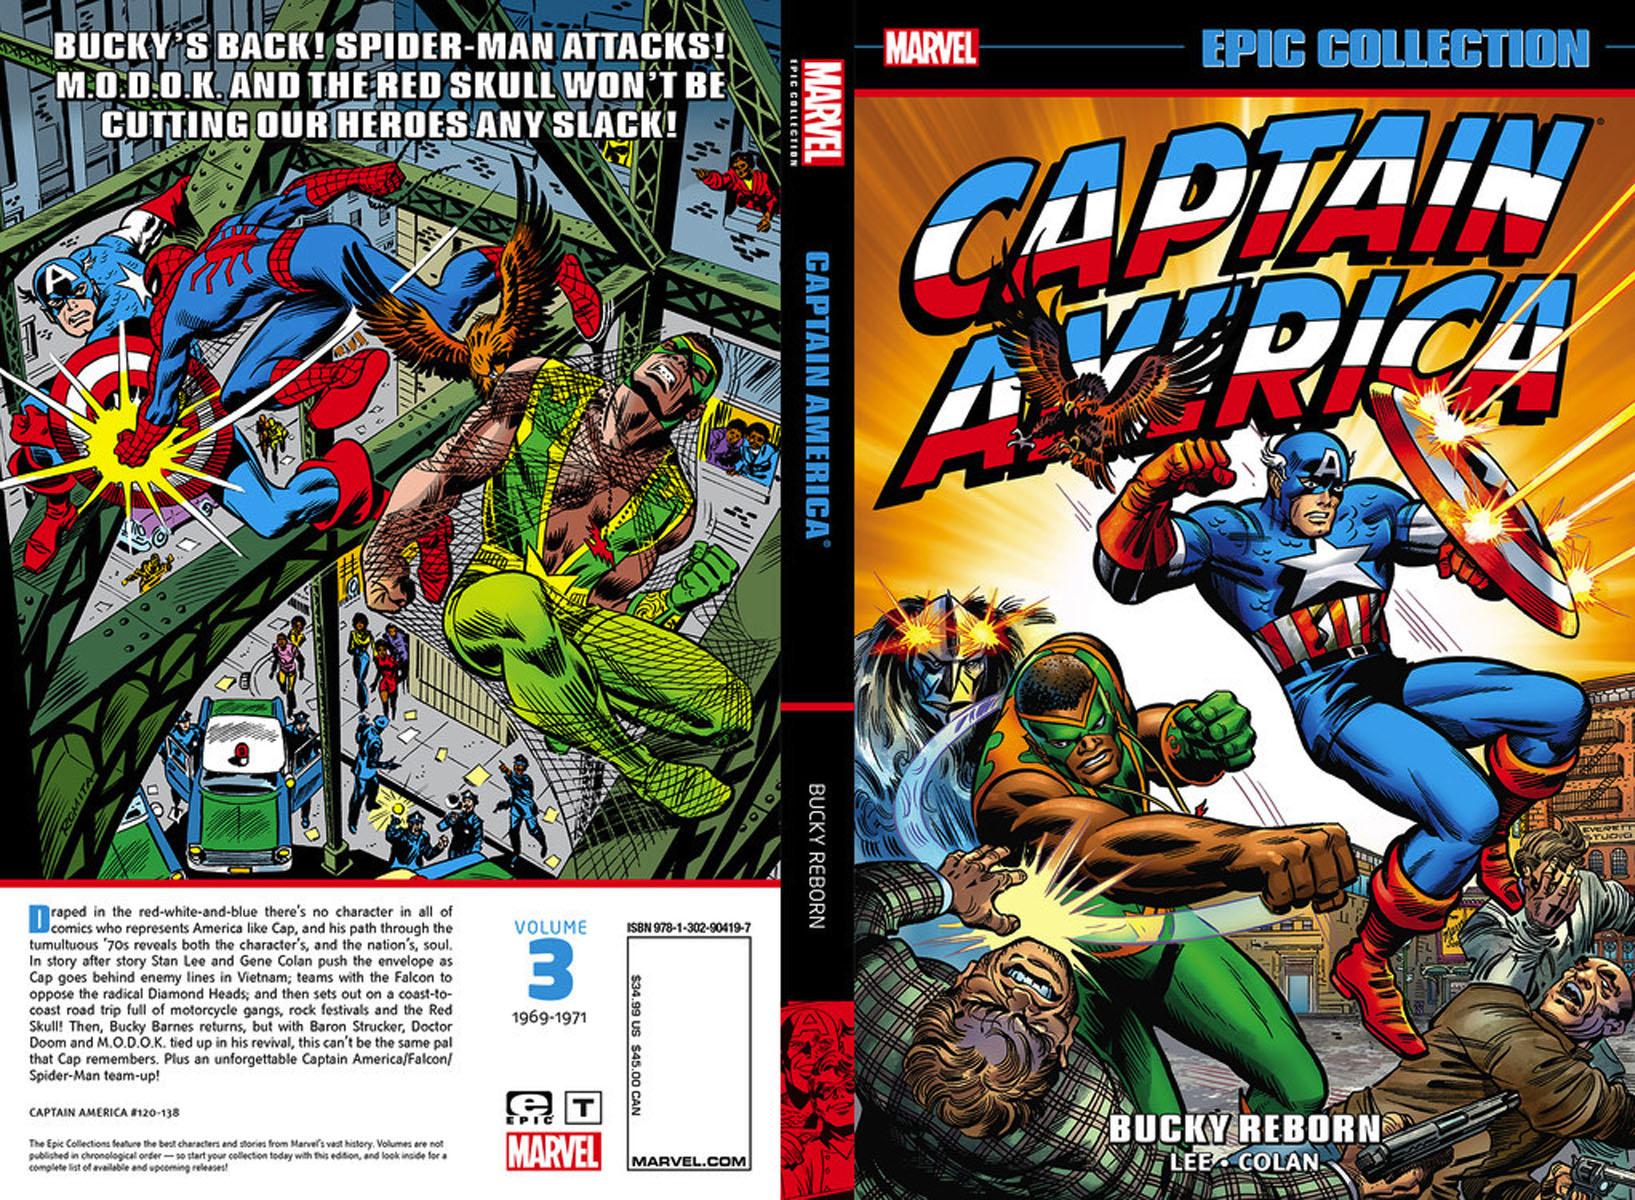 Captain America Epic Collection: Bucky Reborn avengers маска captain america цвет голубой